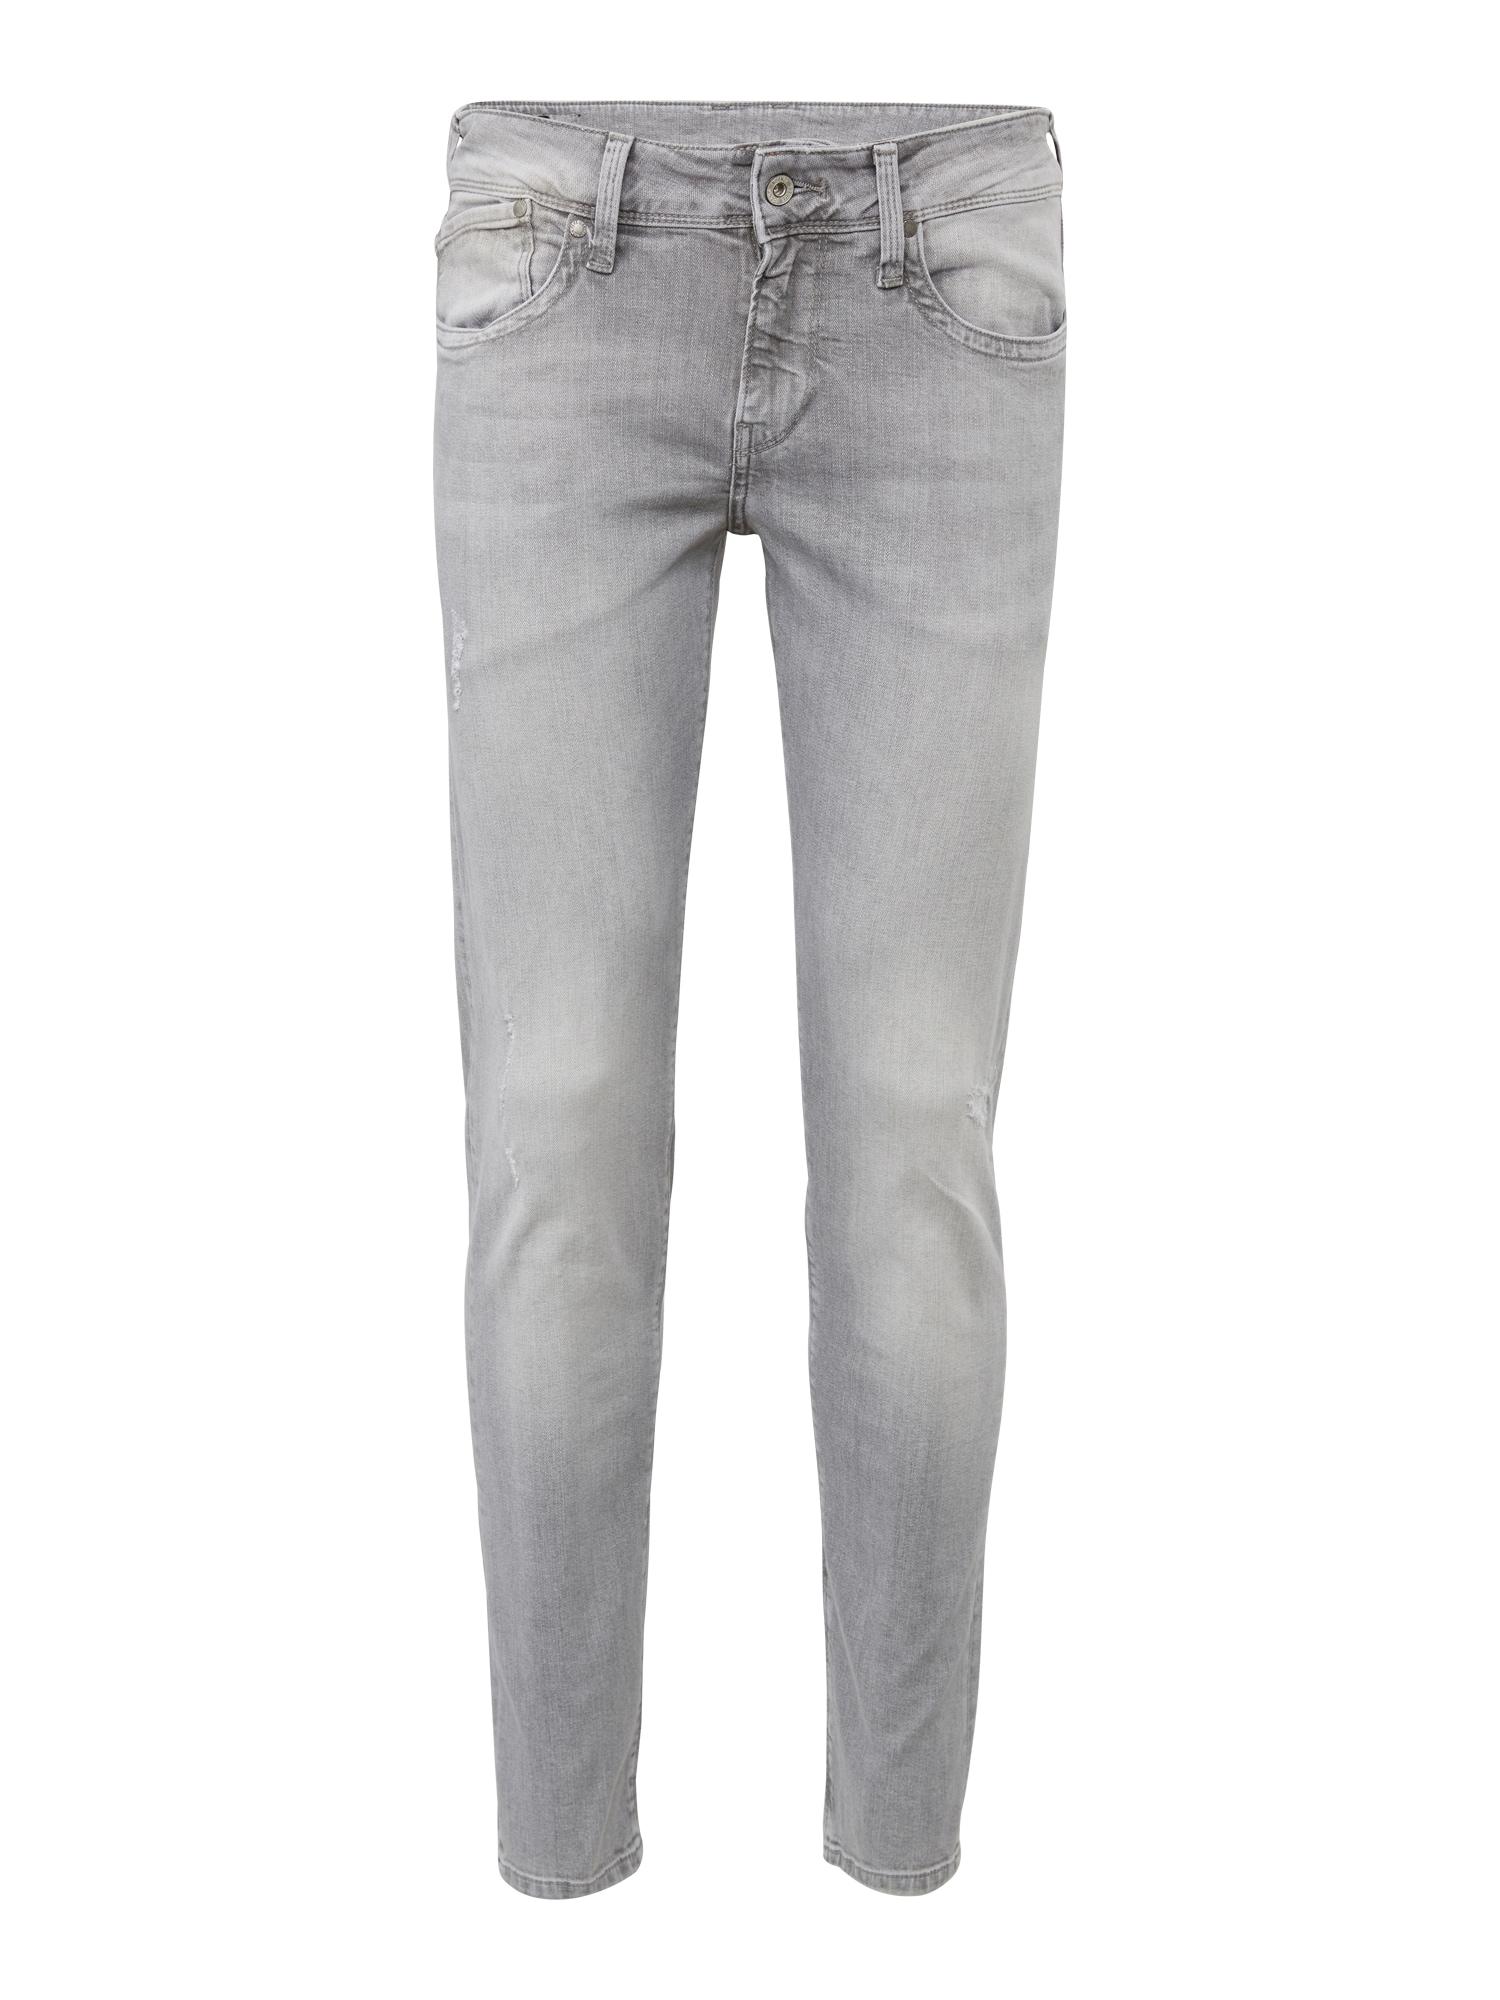 Pepe Jeans Heren Jeans Hatch grey denim